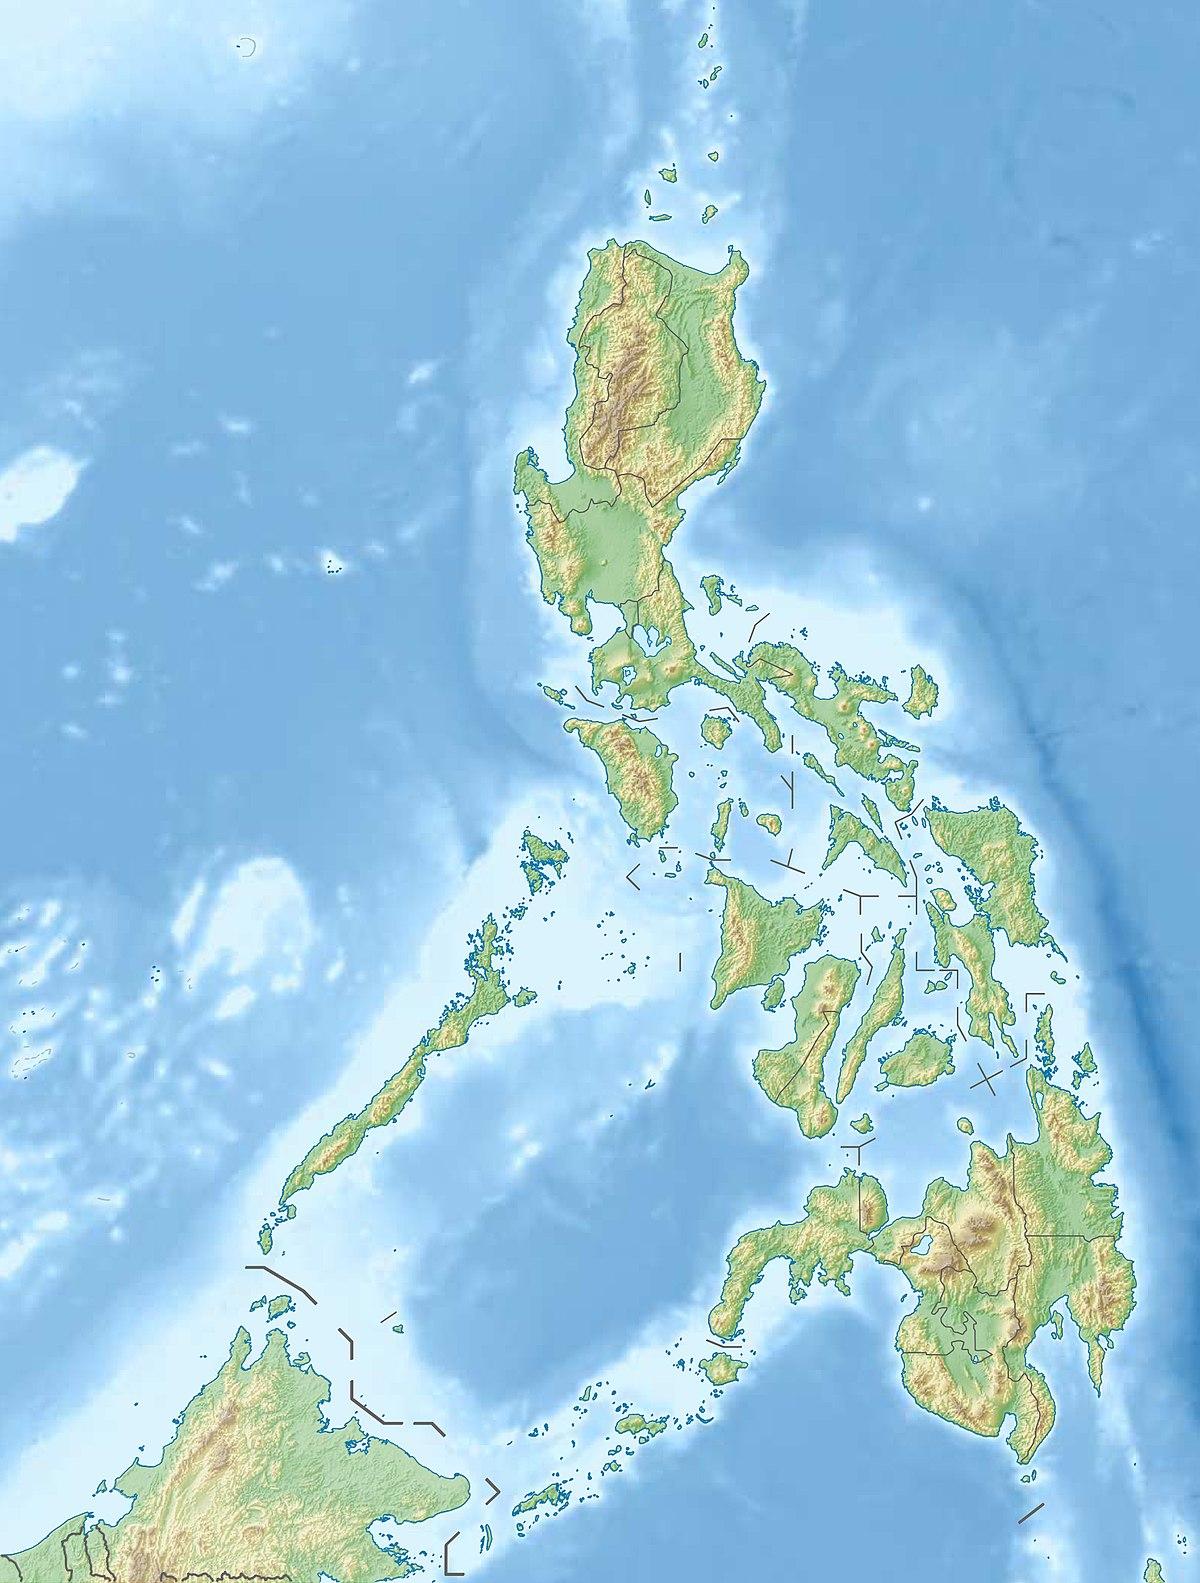 Philippines relief location map.jpg